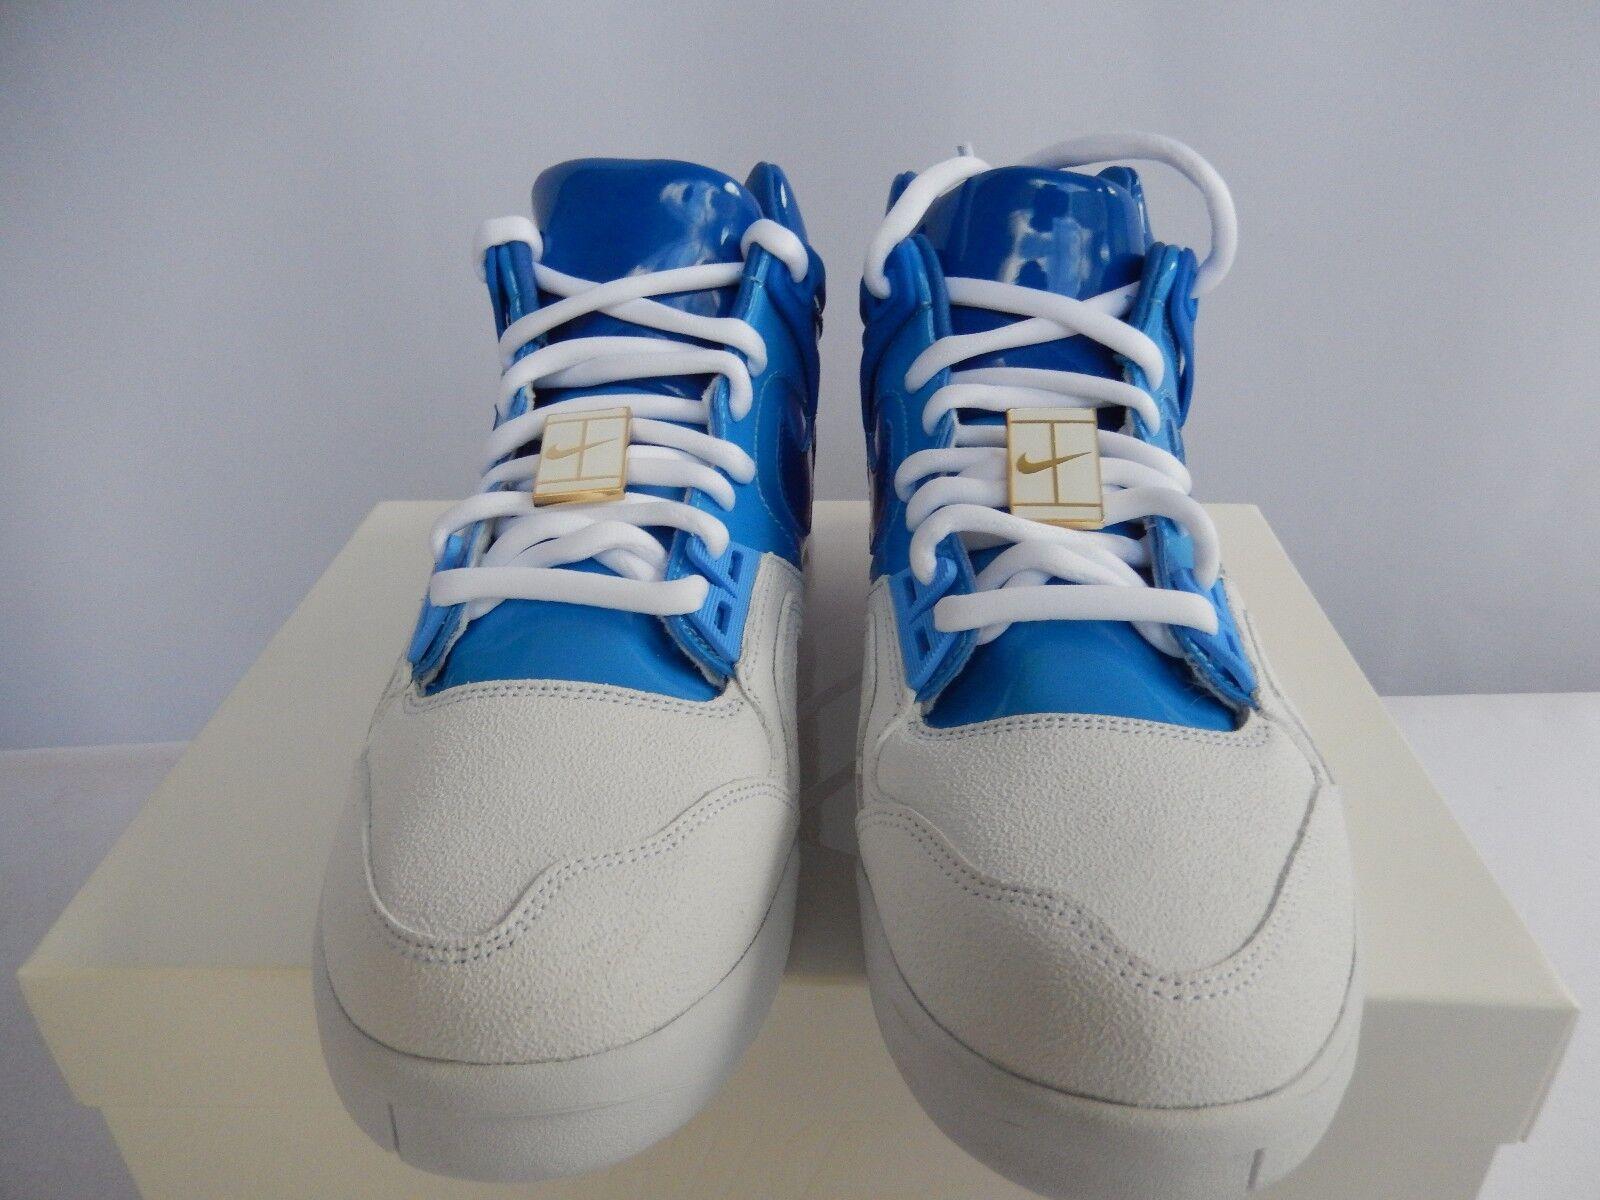 sports shoes 5186c 24390 ... NIKE AIR TECH CHALLENGE II 2 SP TENNIS USA EDITION EDITION EDITION SZ  9.5  621358 ...